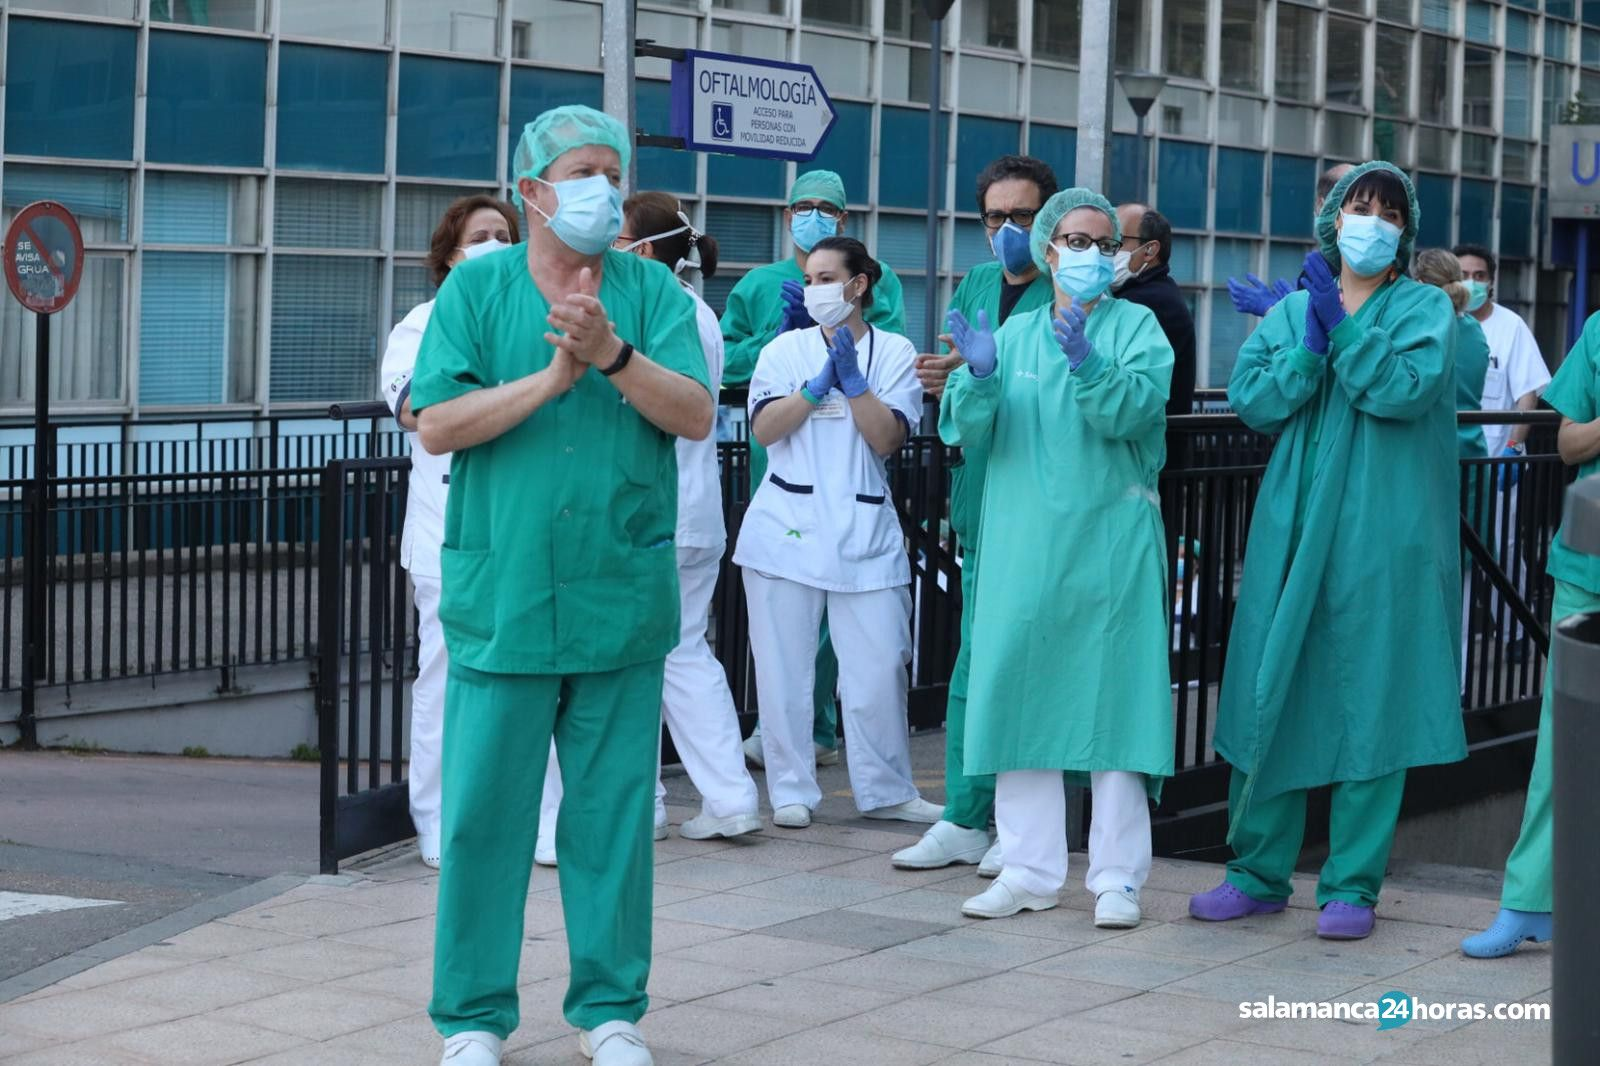 Aplausos sanitarios (6)